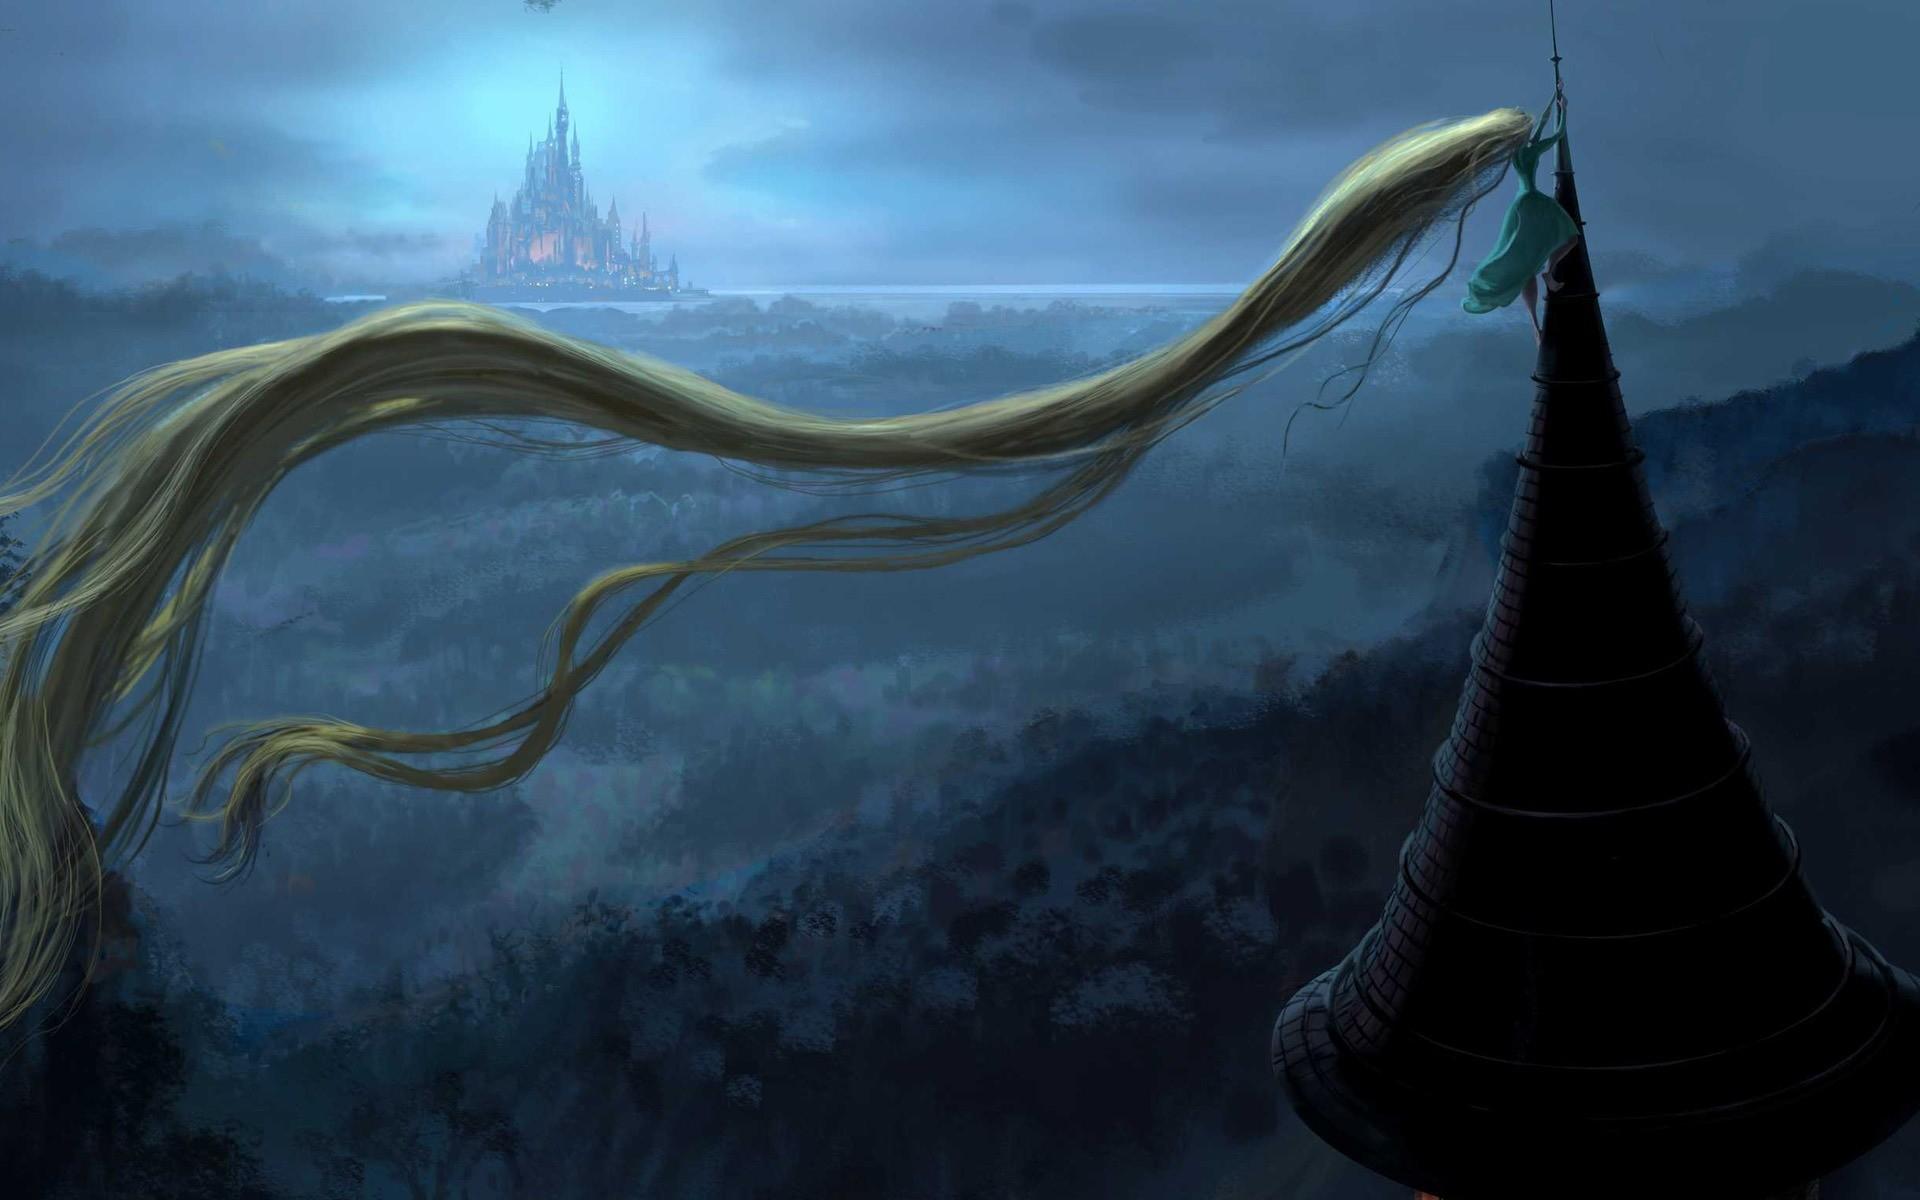 Tangled images Rapunzel wallpaper and background photos 1280×1024 Tangled  Rapunzel Wallpapers (45 Wallpapers) | Adorable Wallpapers | Desktop |  Pinterest …